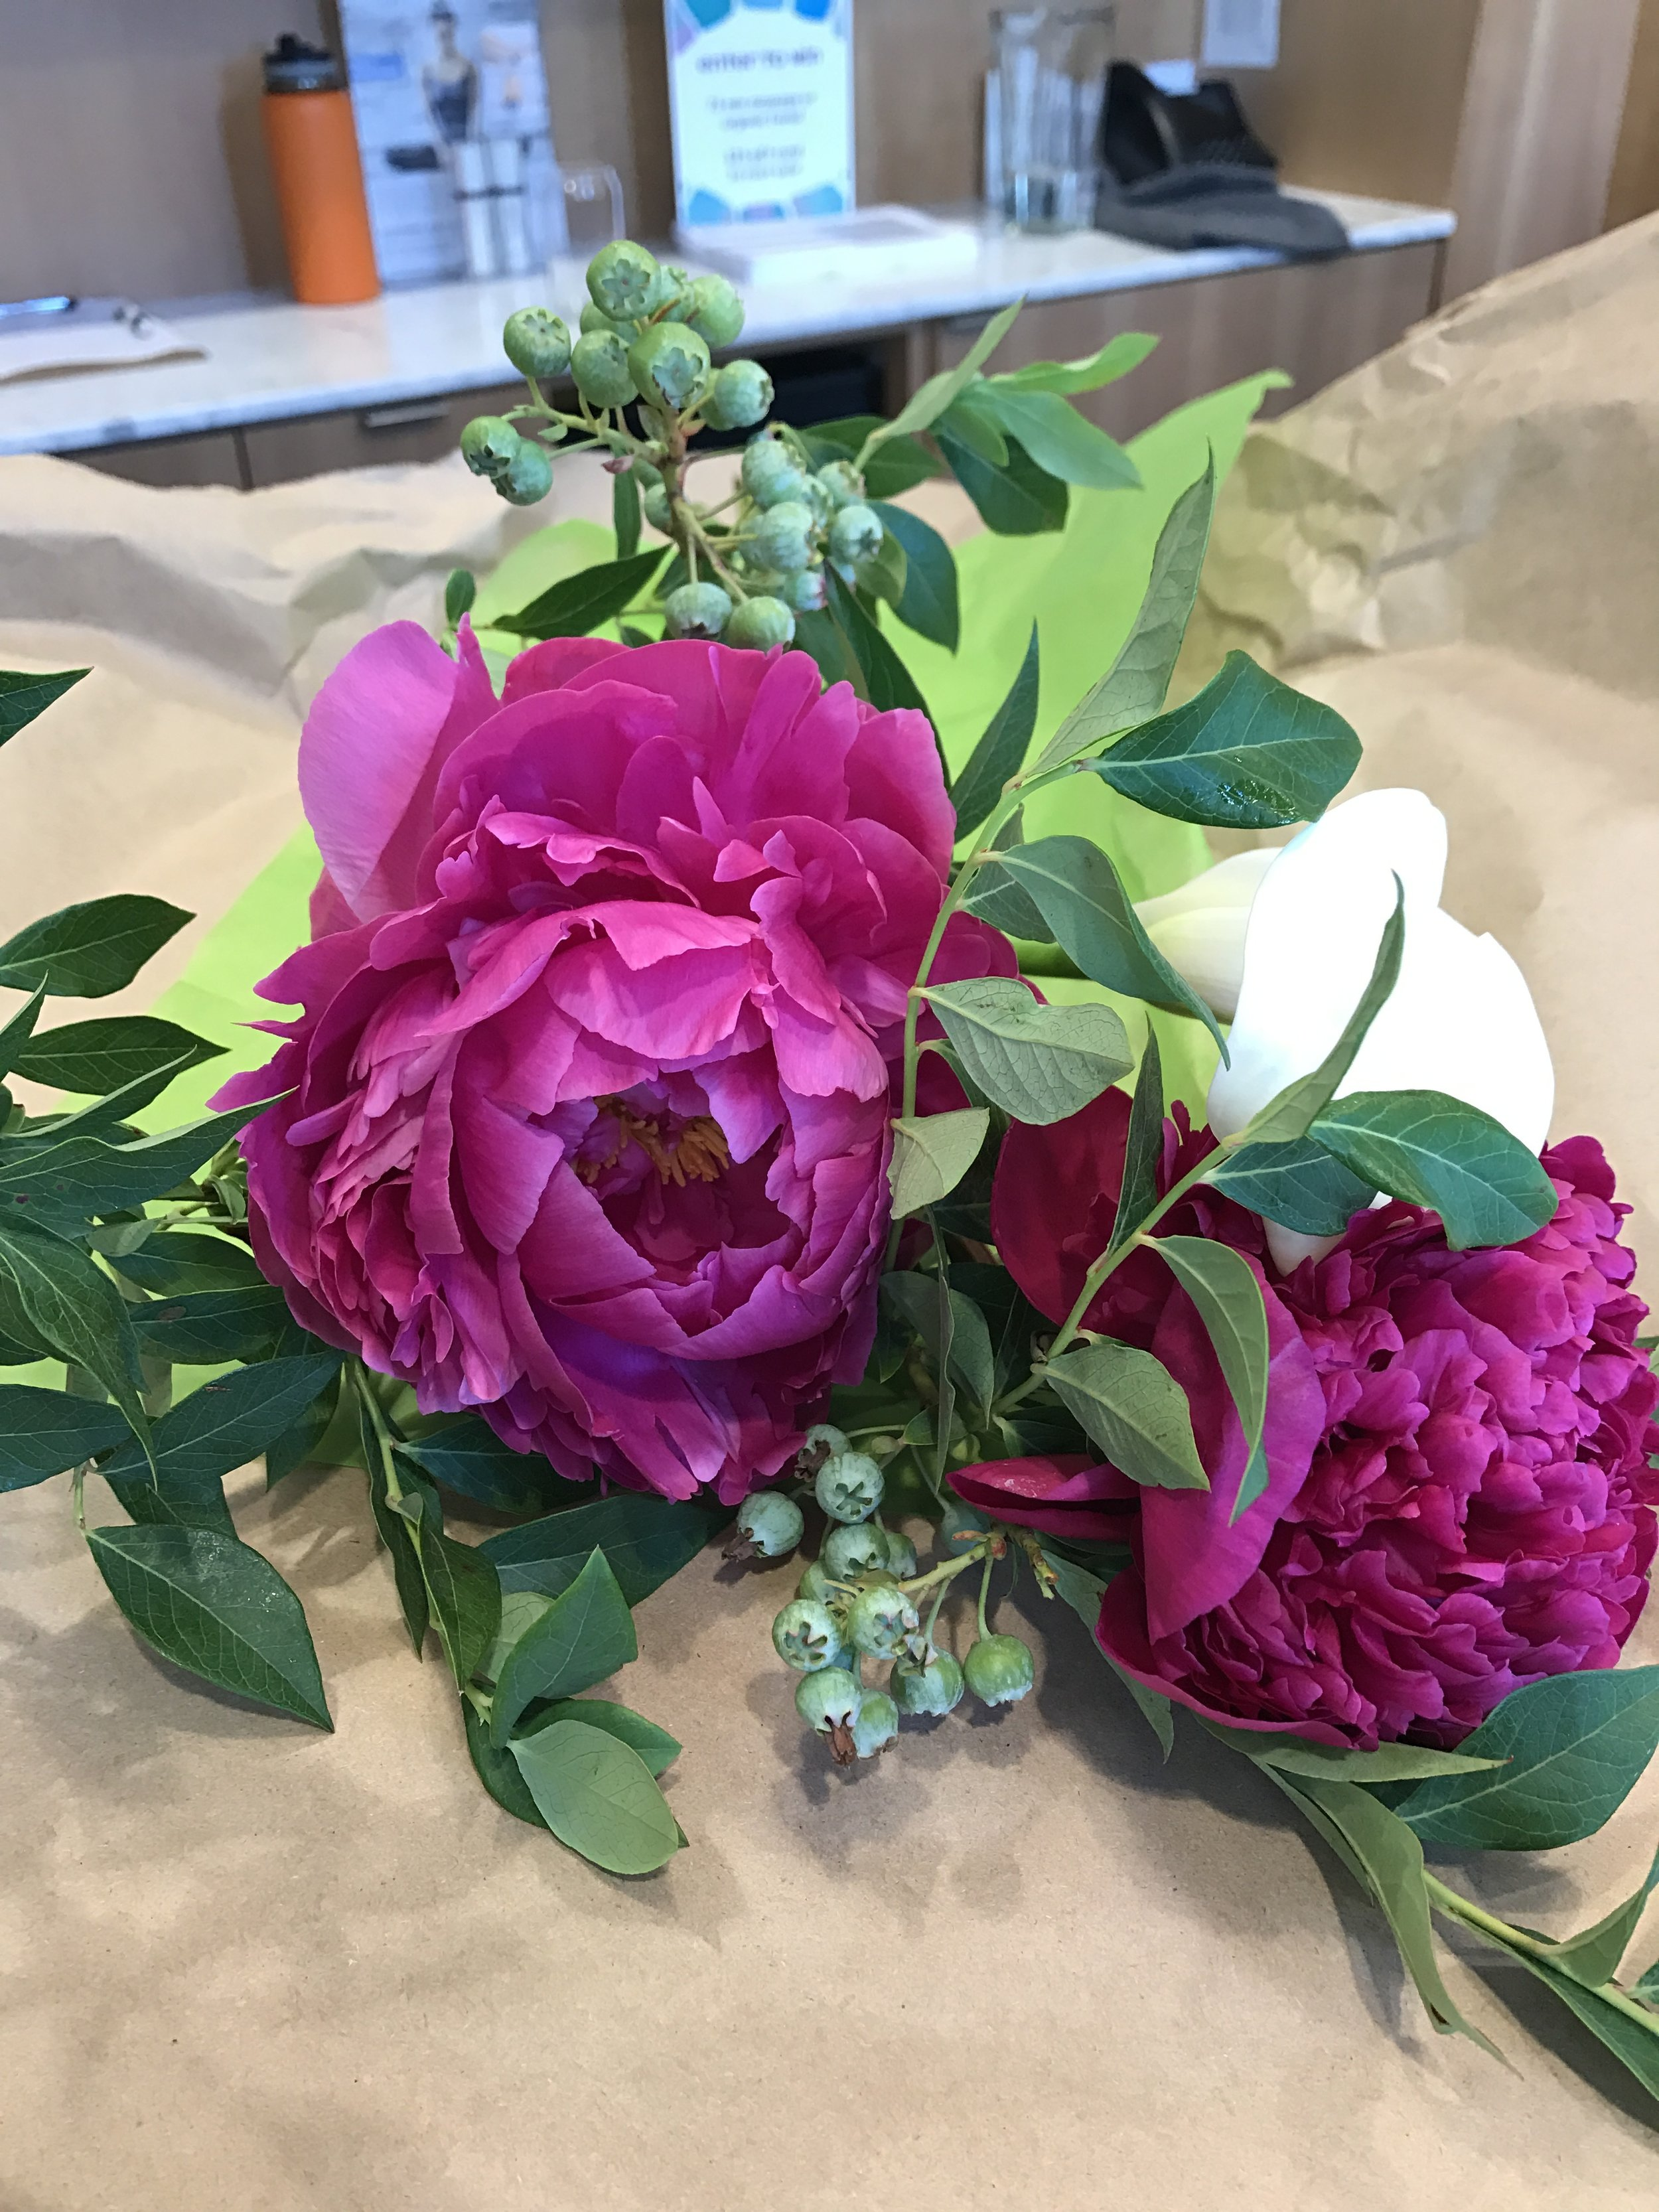 Gorgeous Flowers from Kat Starbird!